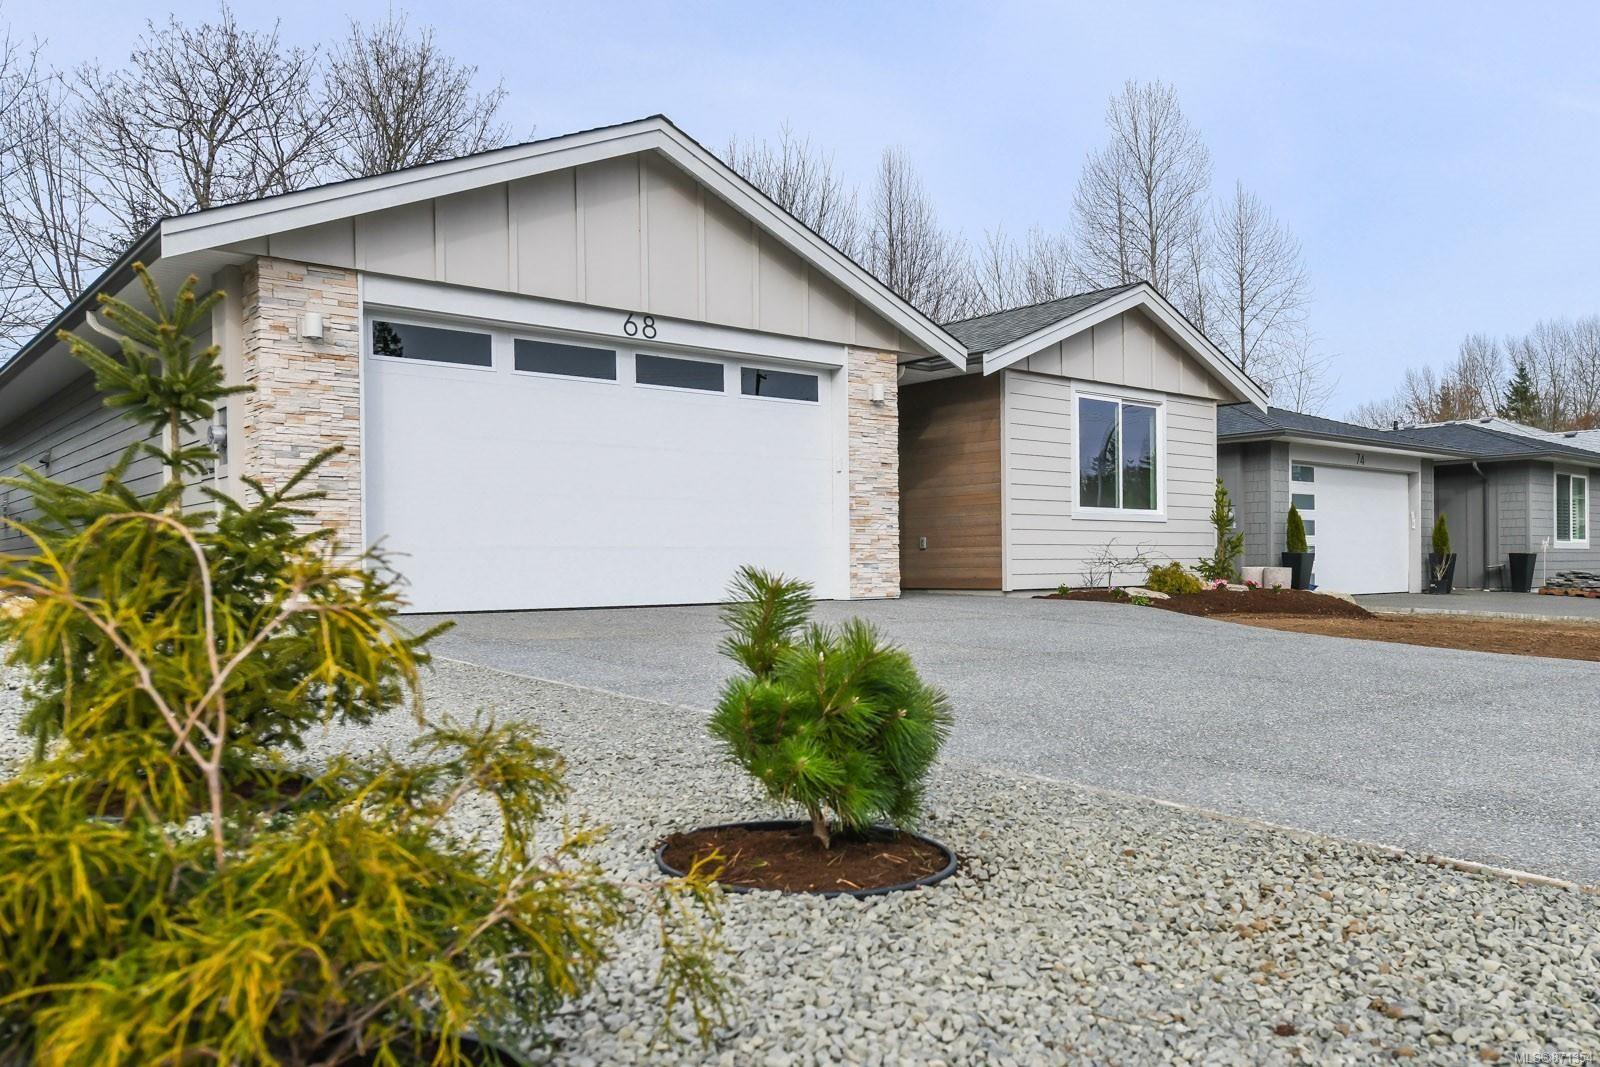 Photo 2: Photos: 68 Grayhawk Pl in : CV Courtenay City House for sale (Comox Valley)  : MLS®# 871354